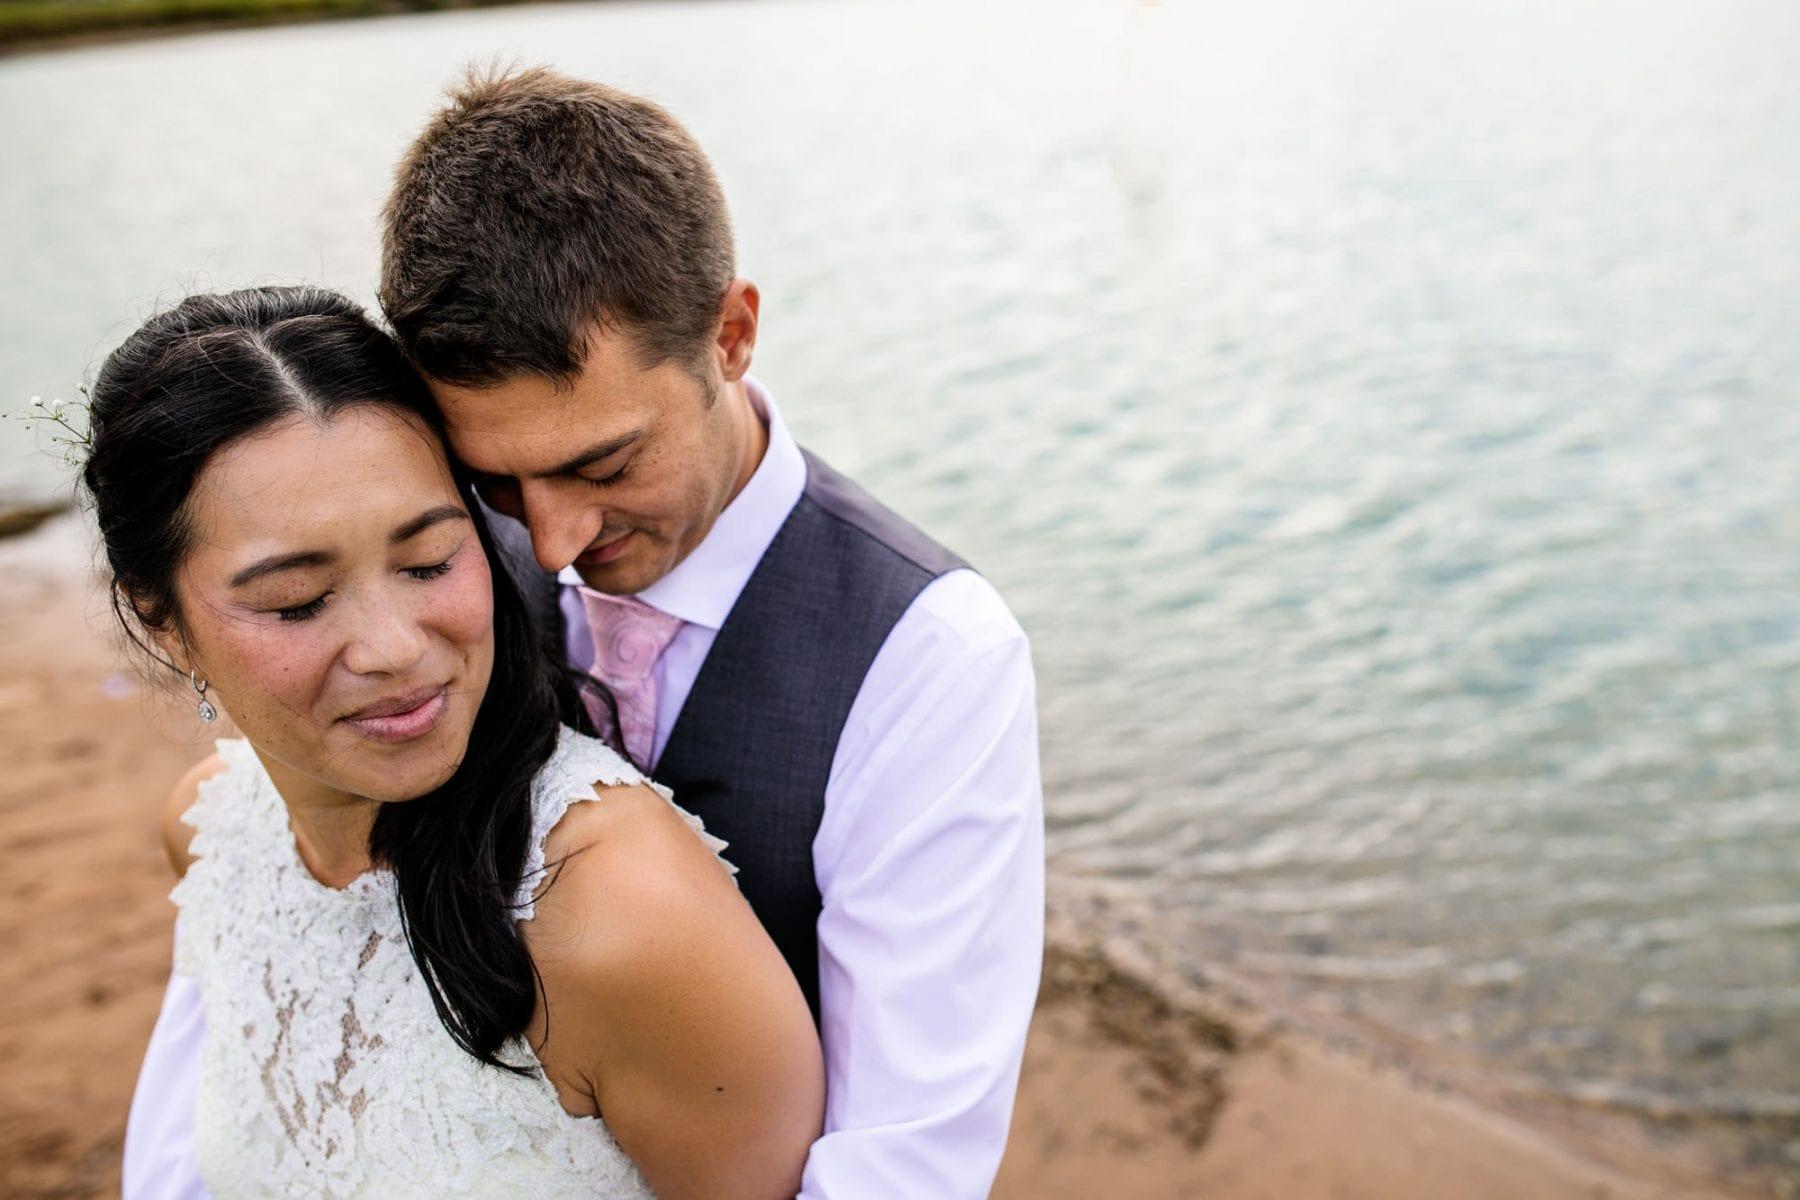 Wedding Photographer Manley Mere